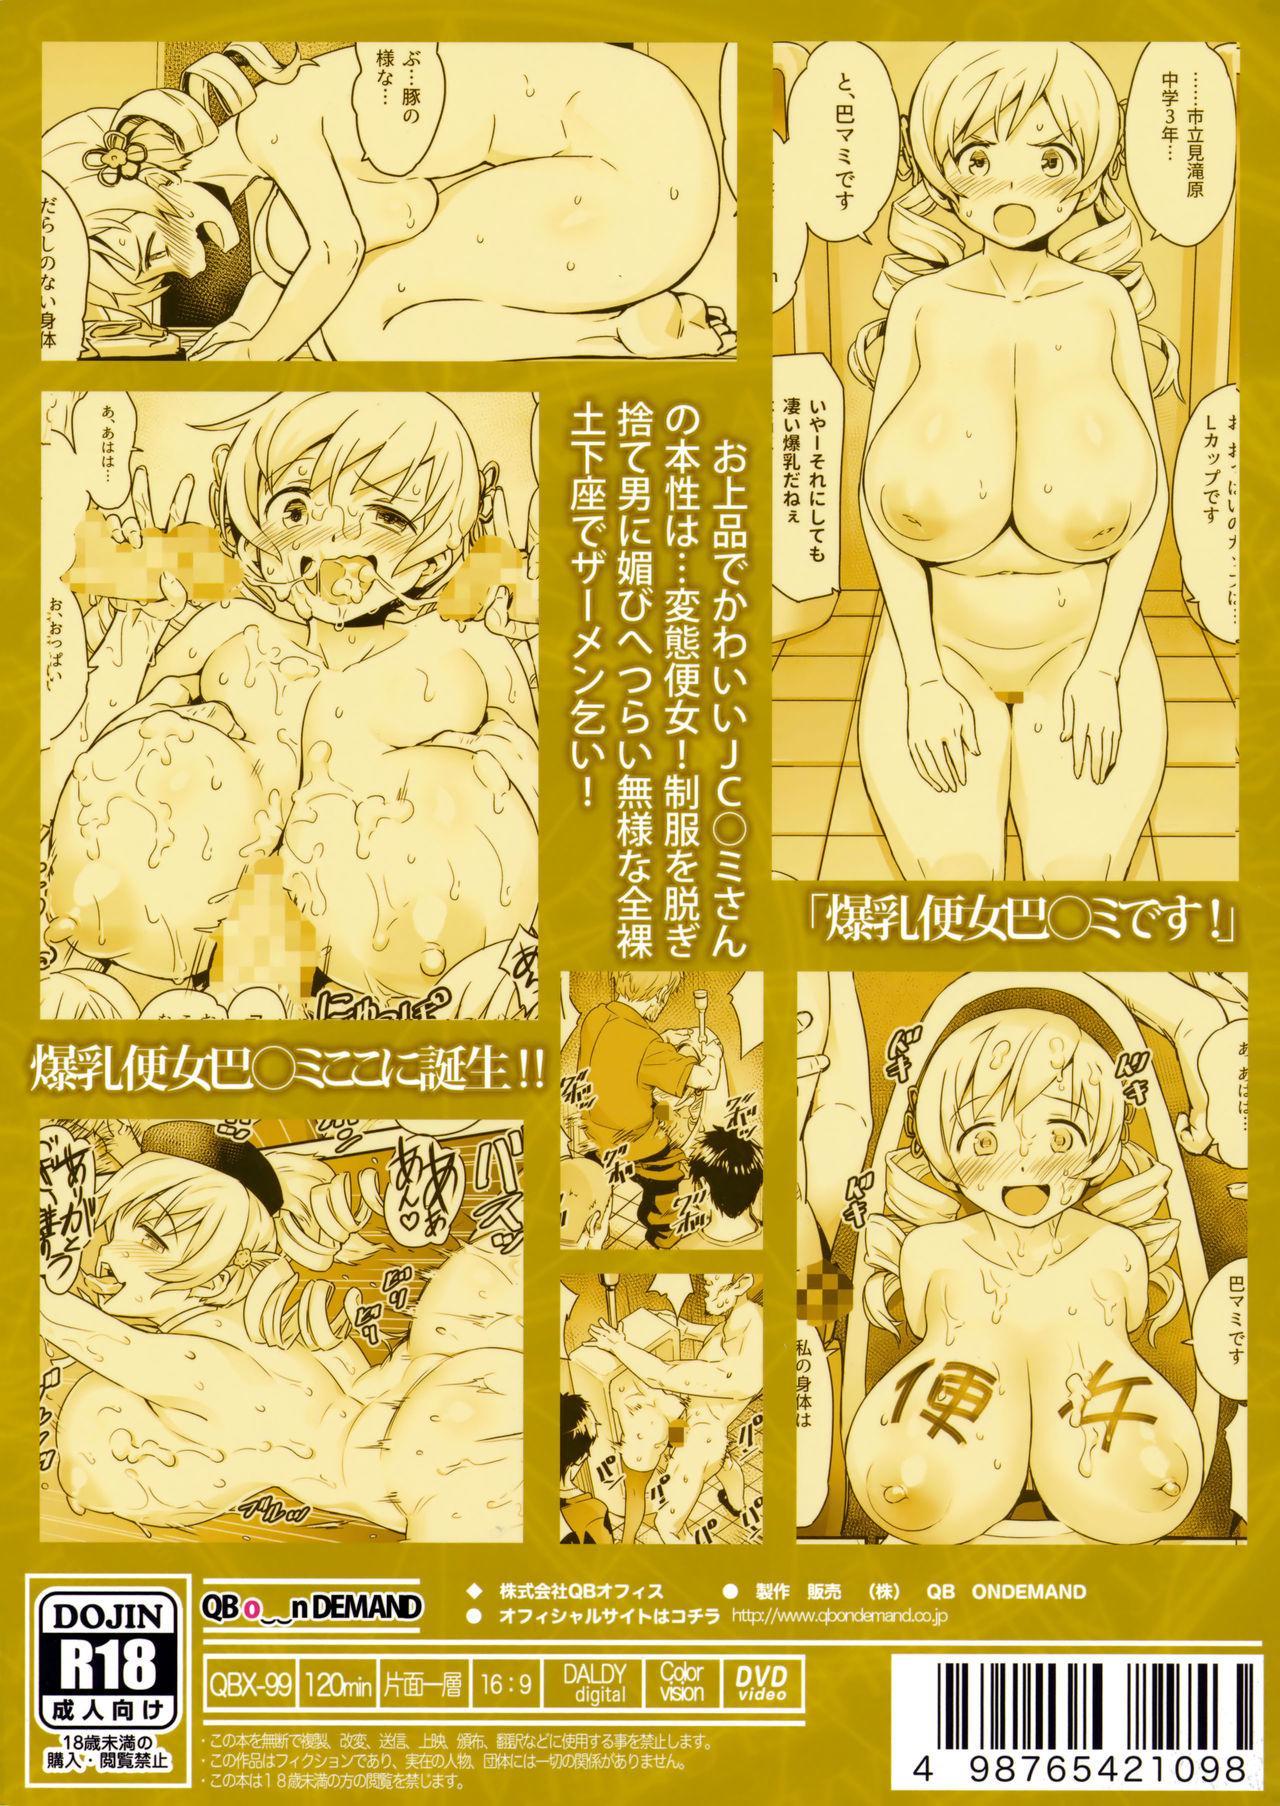 Shiritsu Mitakihara Chuugaku 3-nensei Bakunyuu Benjo Tomoe Mami | Mitakihara City Middle School's Third Year Cow Titted Cumdump Tomoe Mami 25